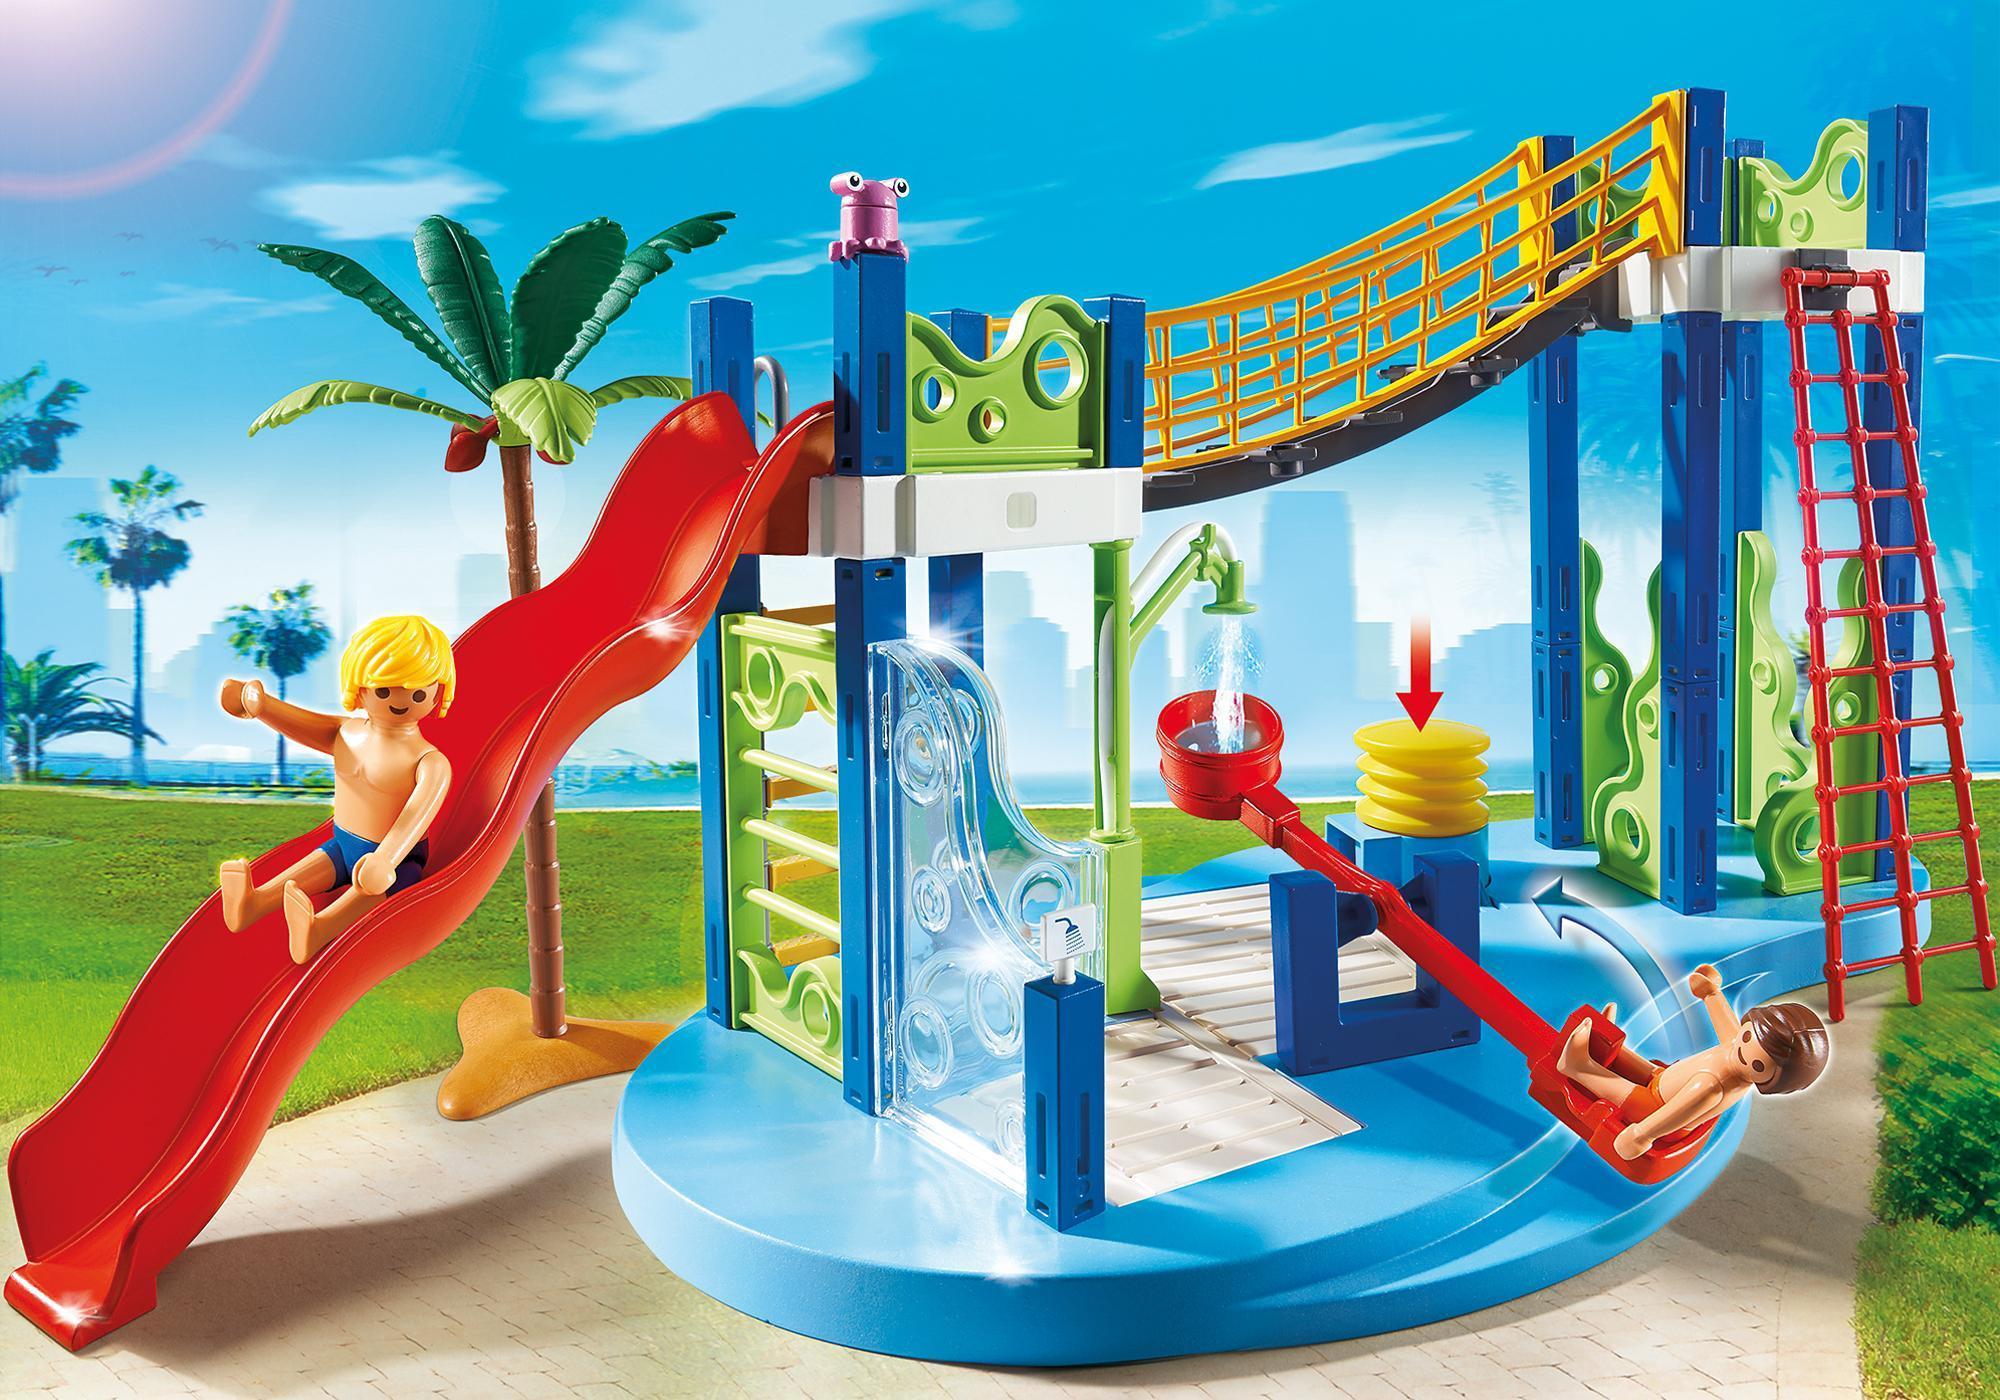 http://media.playmobil.com/i/playmobil/6670_product_detail/Wodny plac zabaw